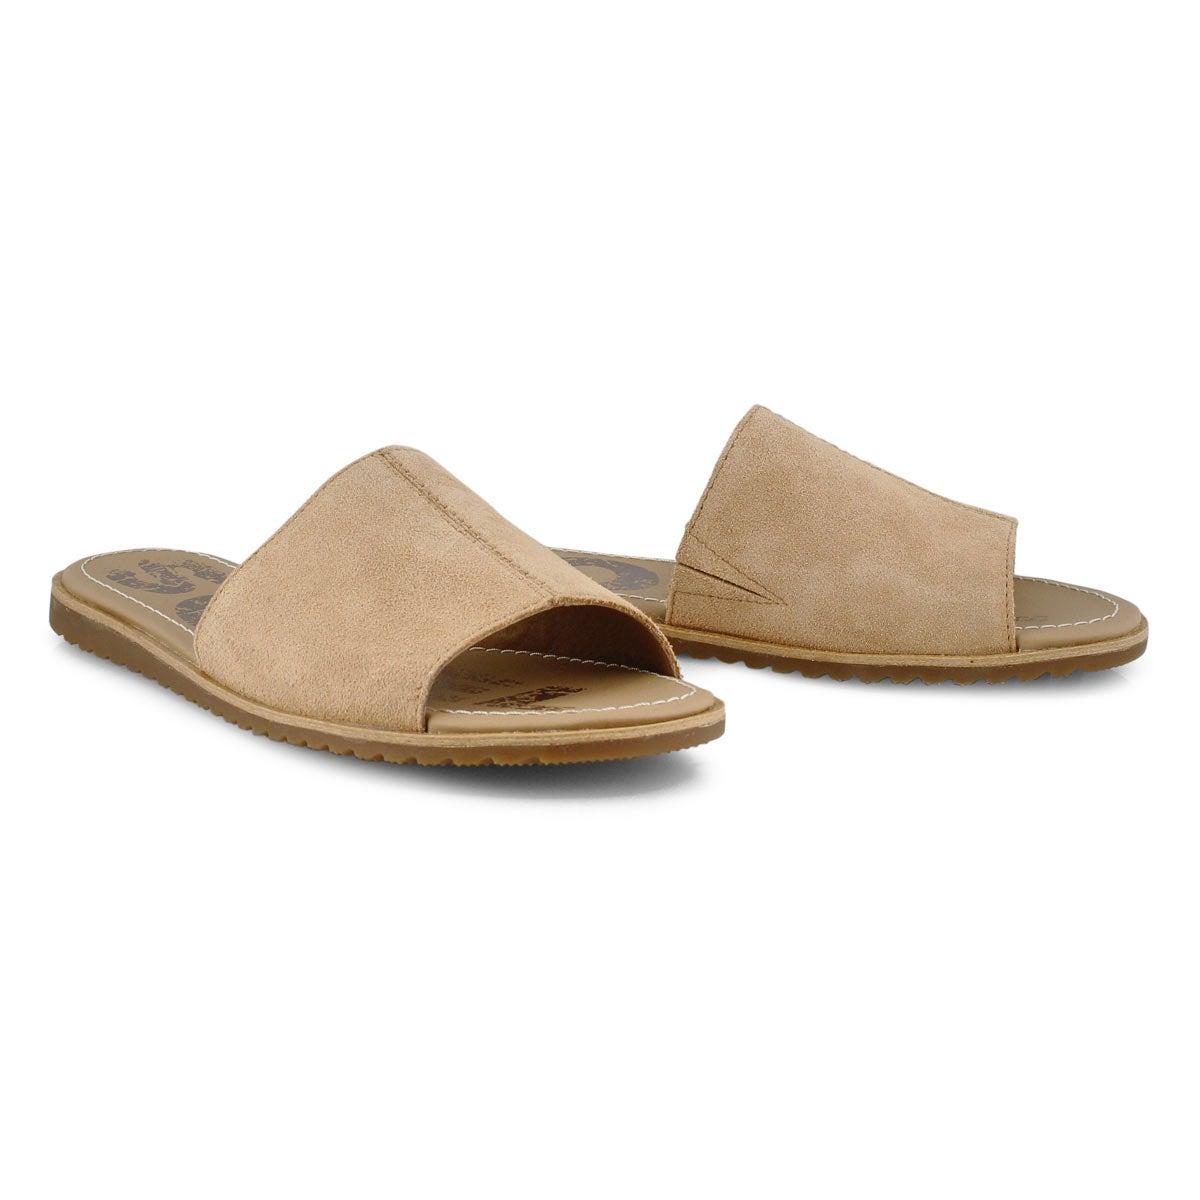 Lds Ella Block honest beige slide sandal